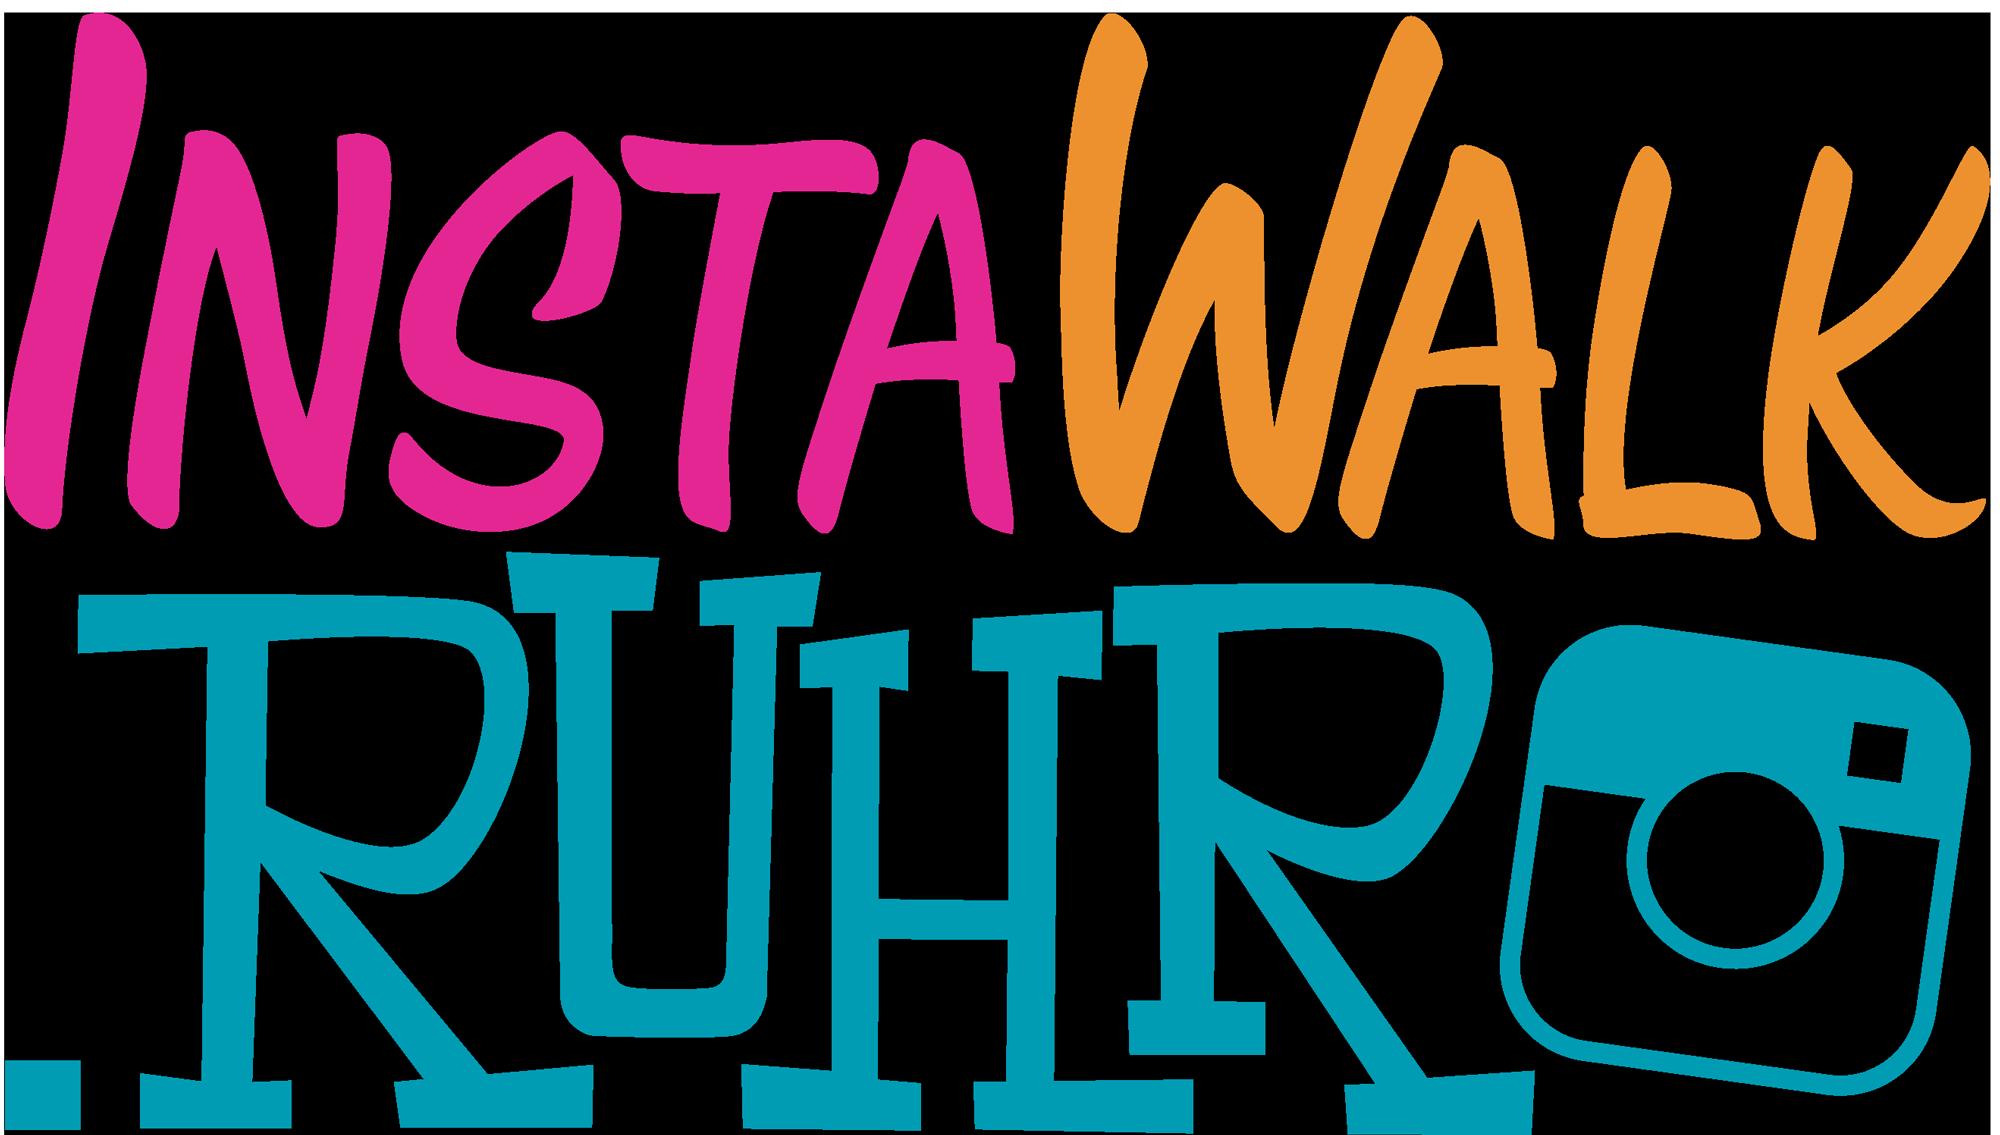 InstaWalk Ruhr